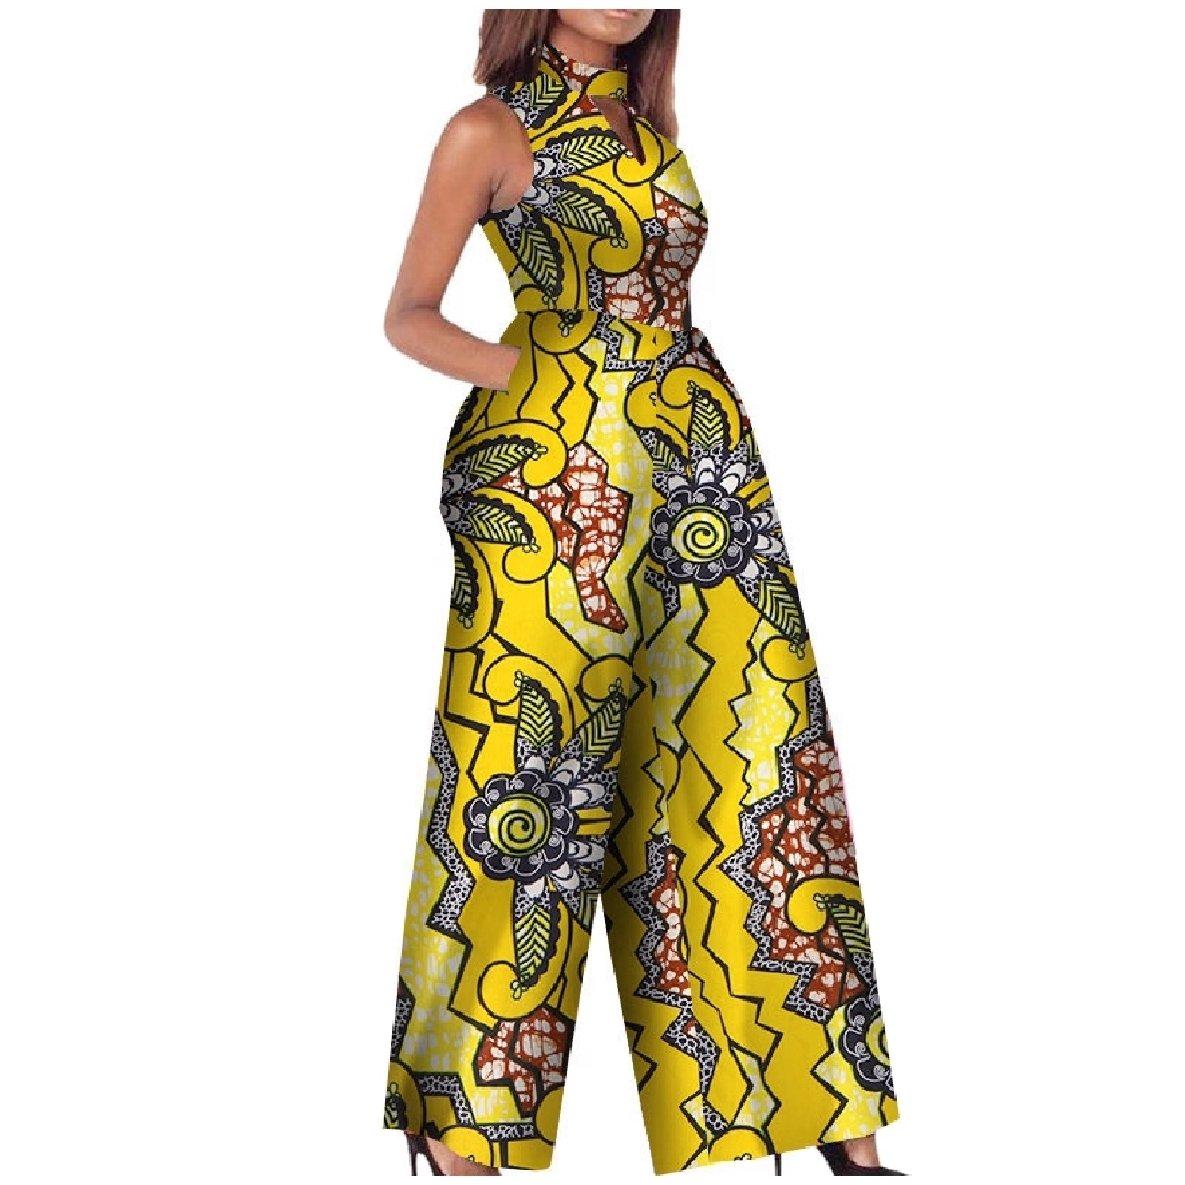 Vska Women's African Wax Fabric Classy Fine Cotton Playsuit Jumpsuit Yellow XS